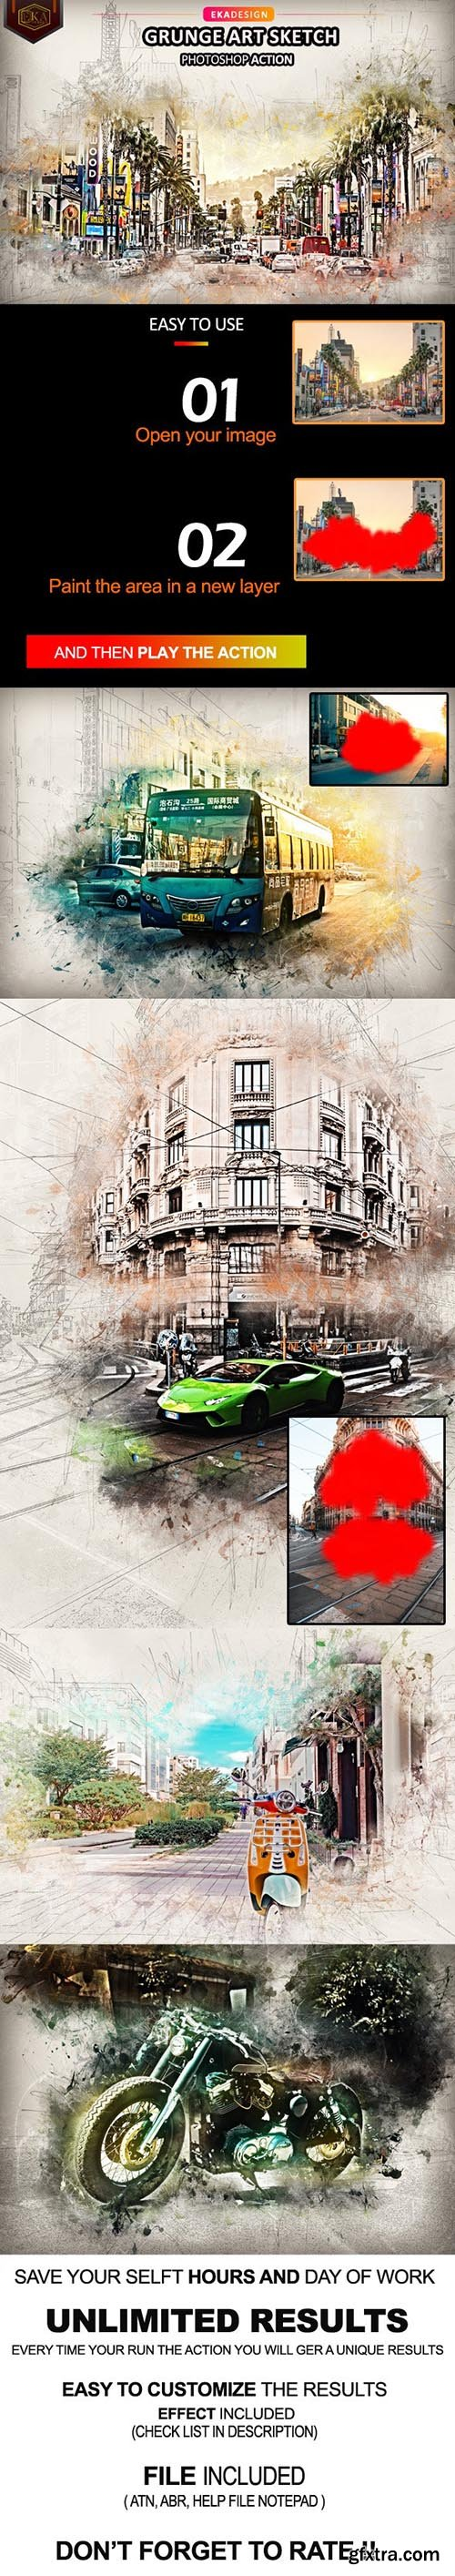 GraphicRiver - Grunge Art Sketch Photosop Action 32980106